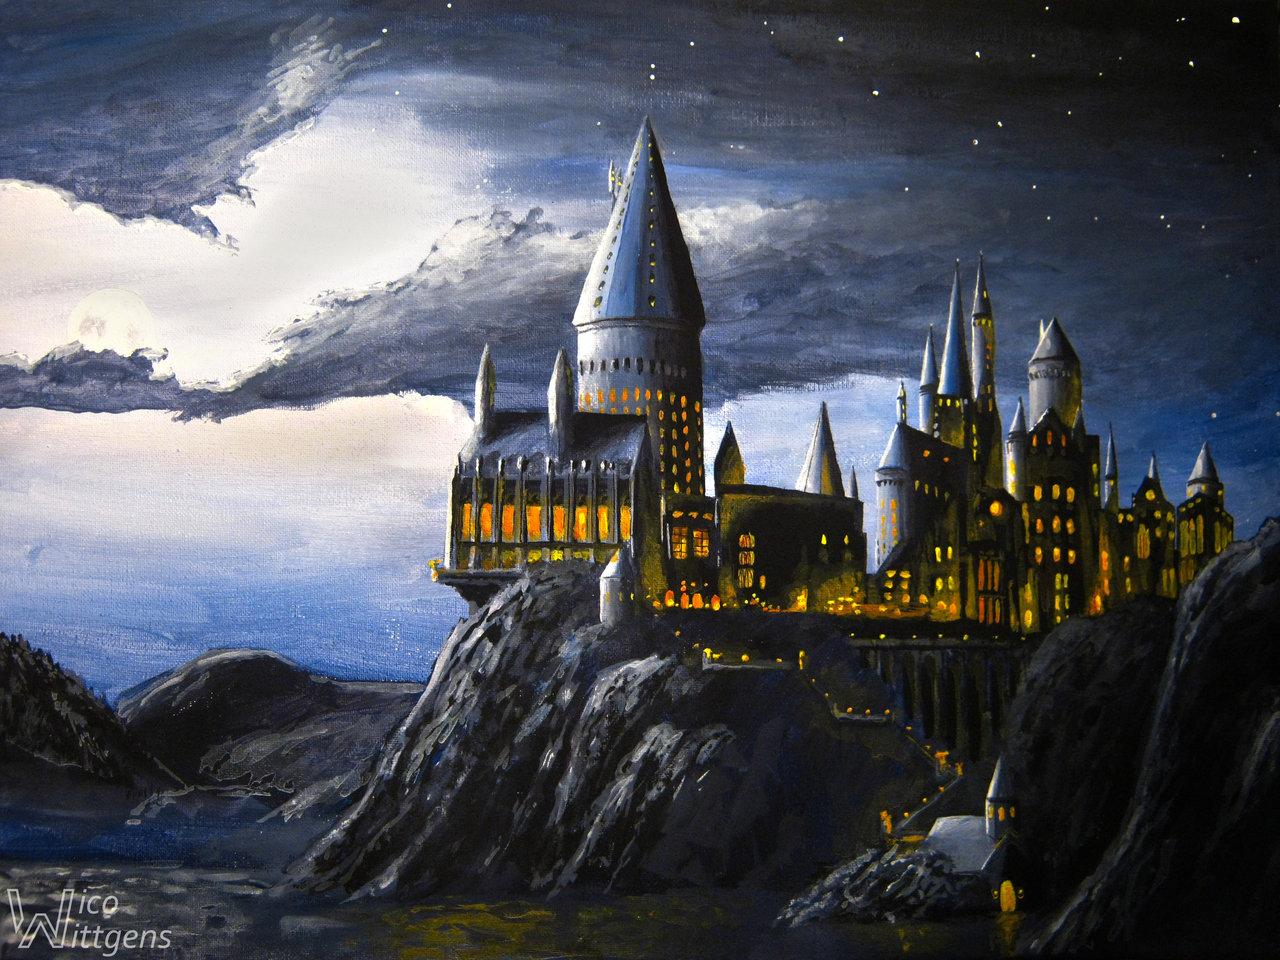 Most Inspiring Wallpaper Harry Potter Scenery - hogwarts-castle-wallpaper-15  Gallery_292718.jpg